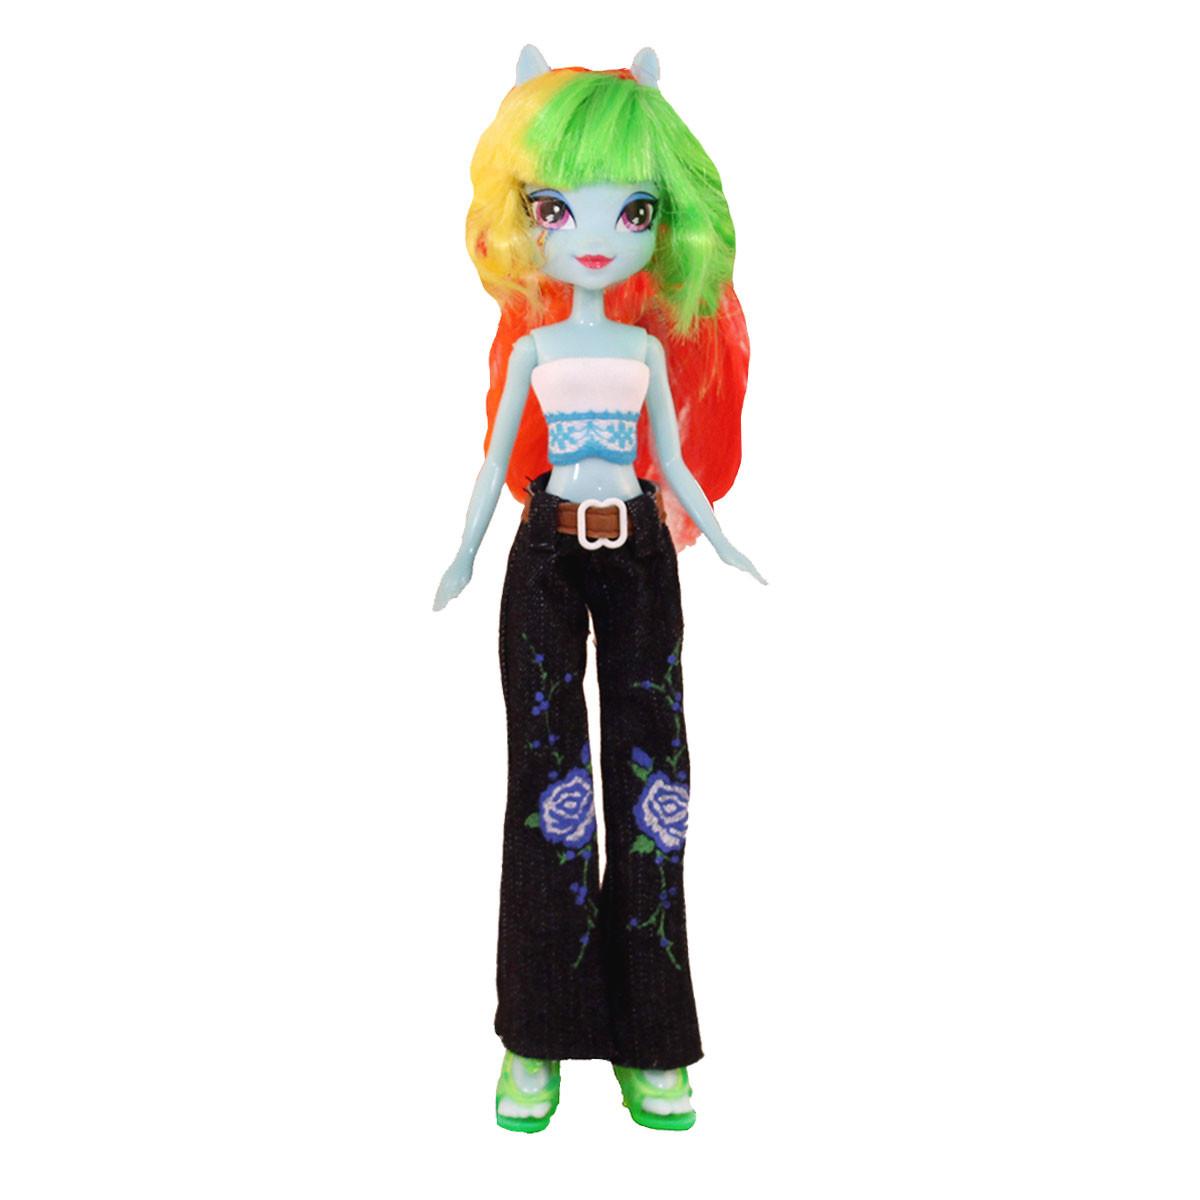 костюмов фото куклы радуги с кодом подготовили